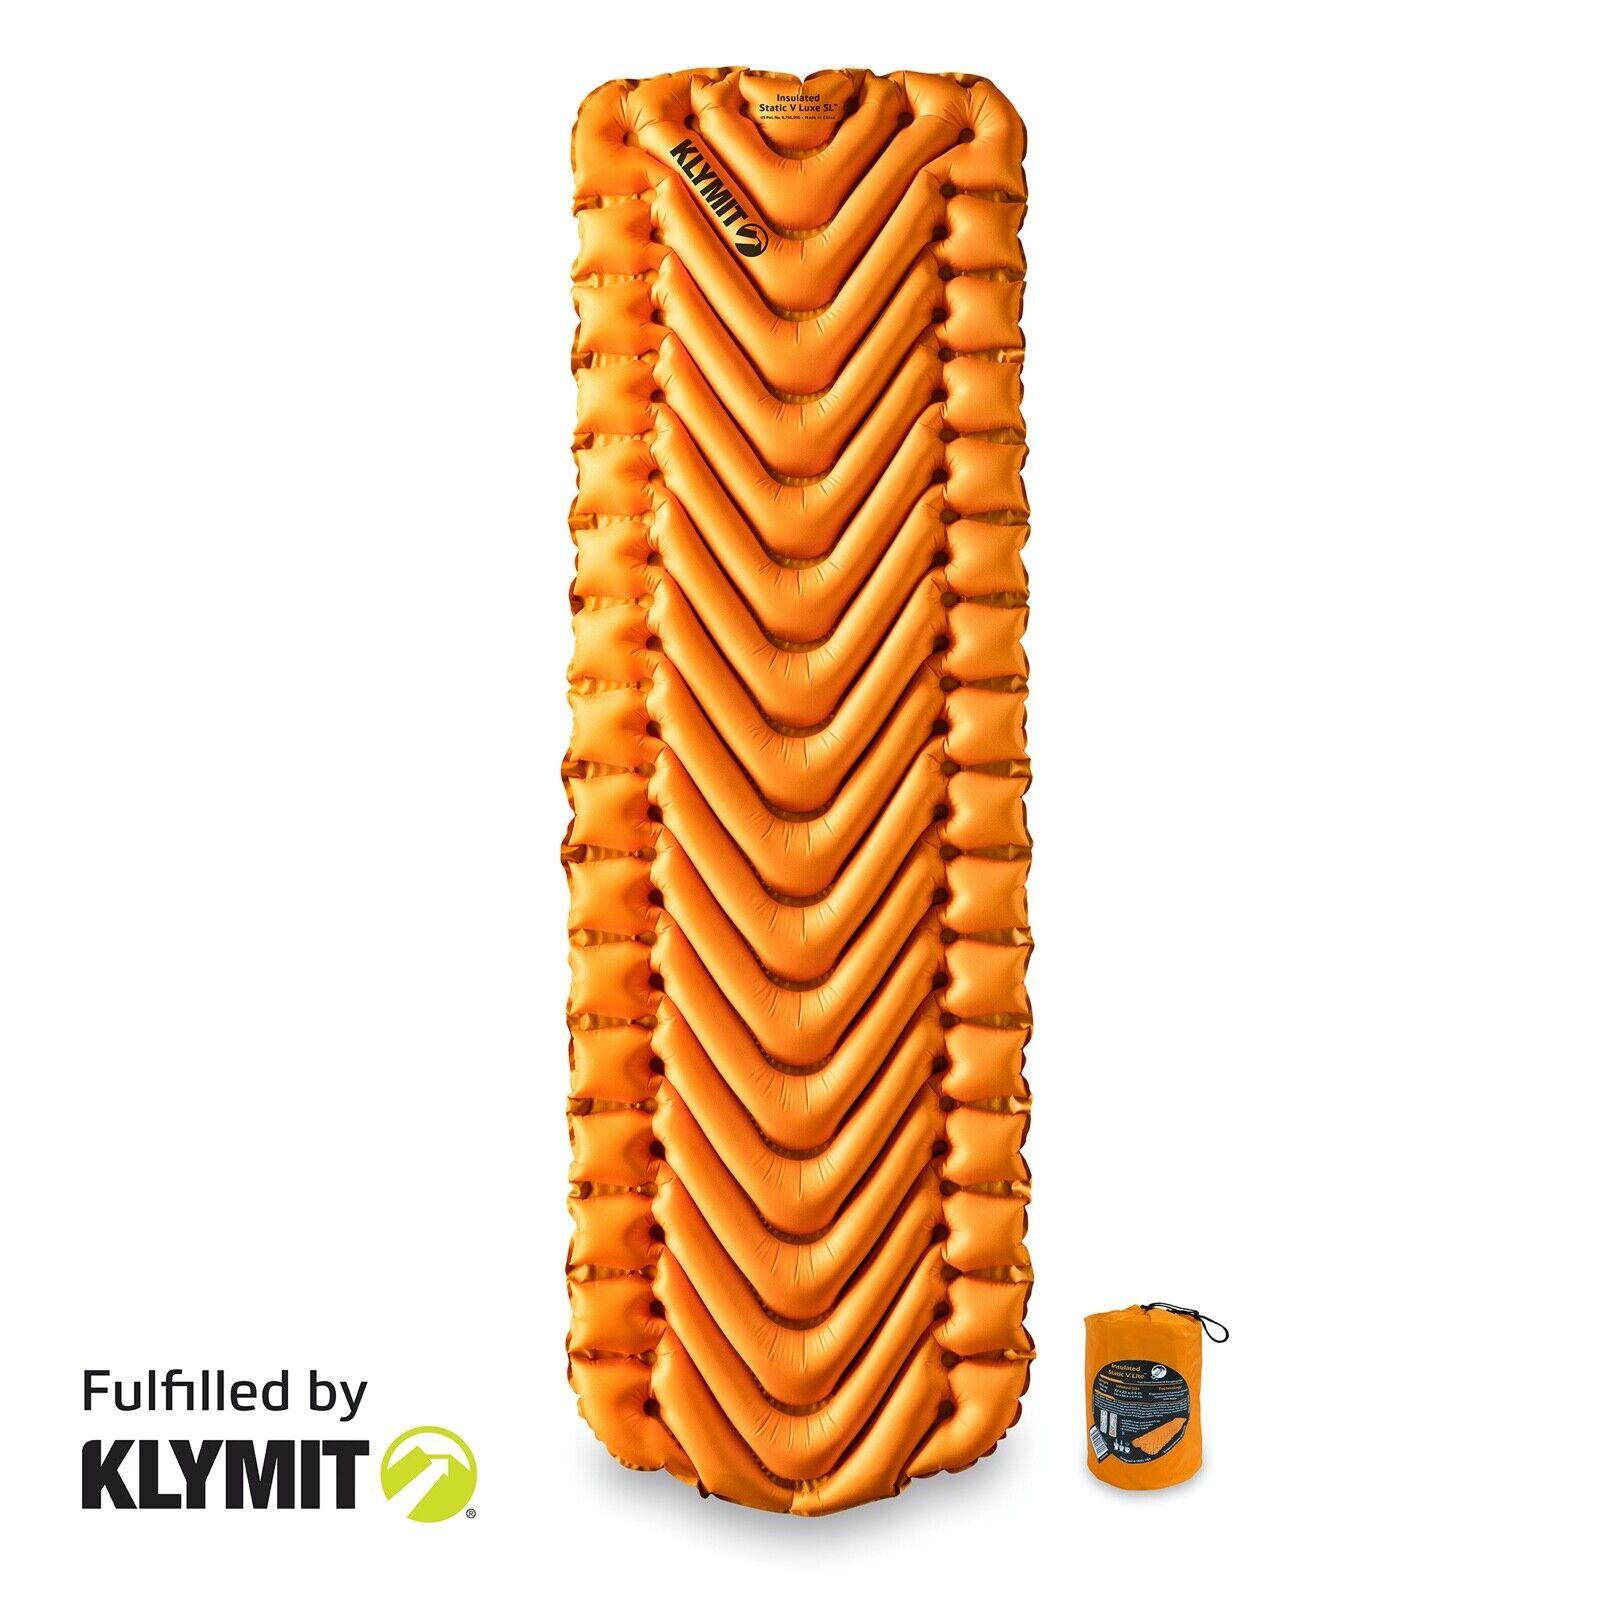 Klymit Insulated Static V2 Sleeping Pad